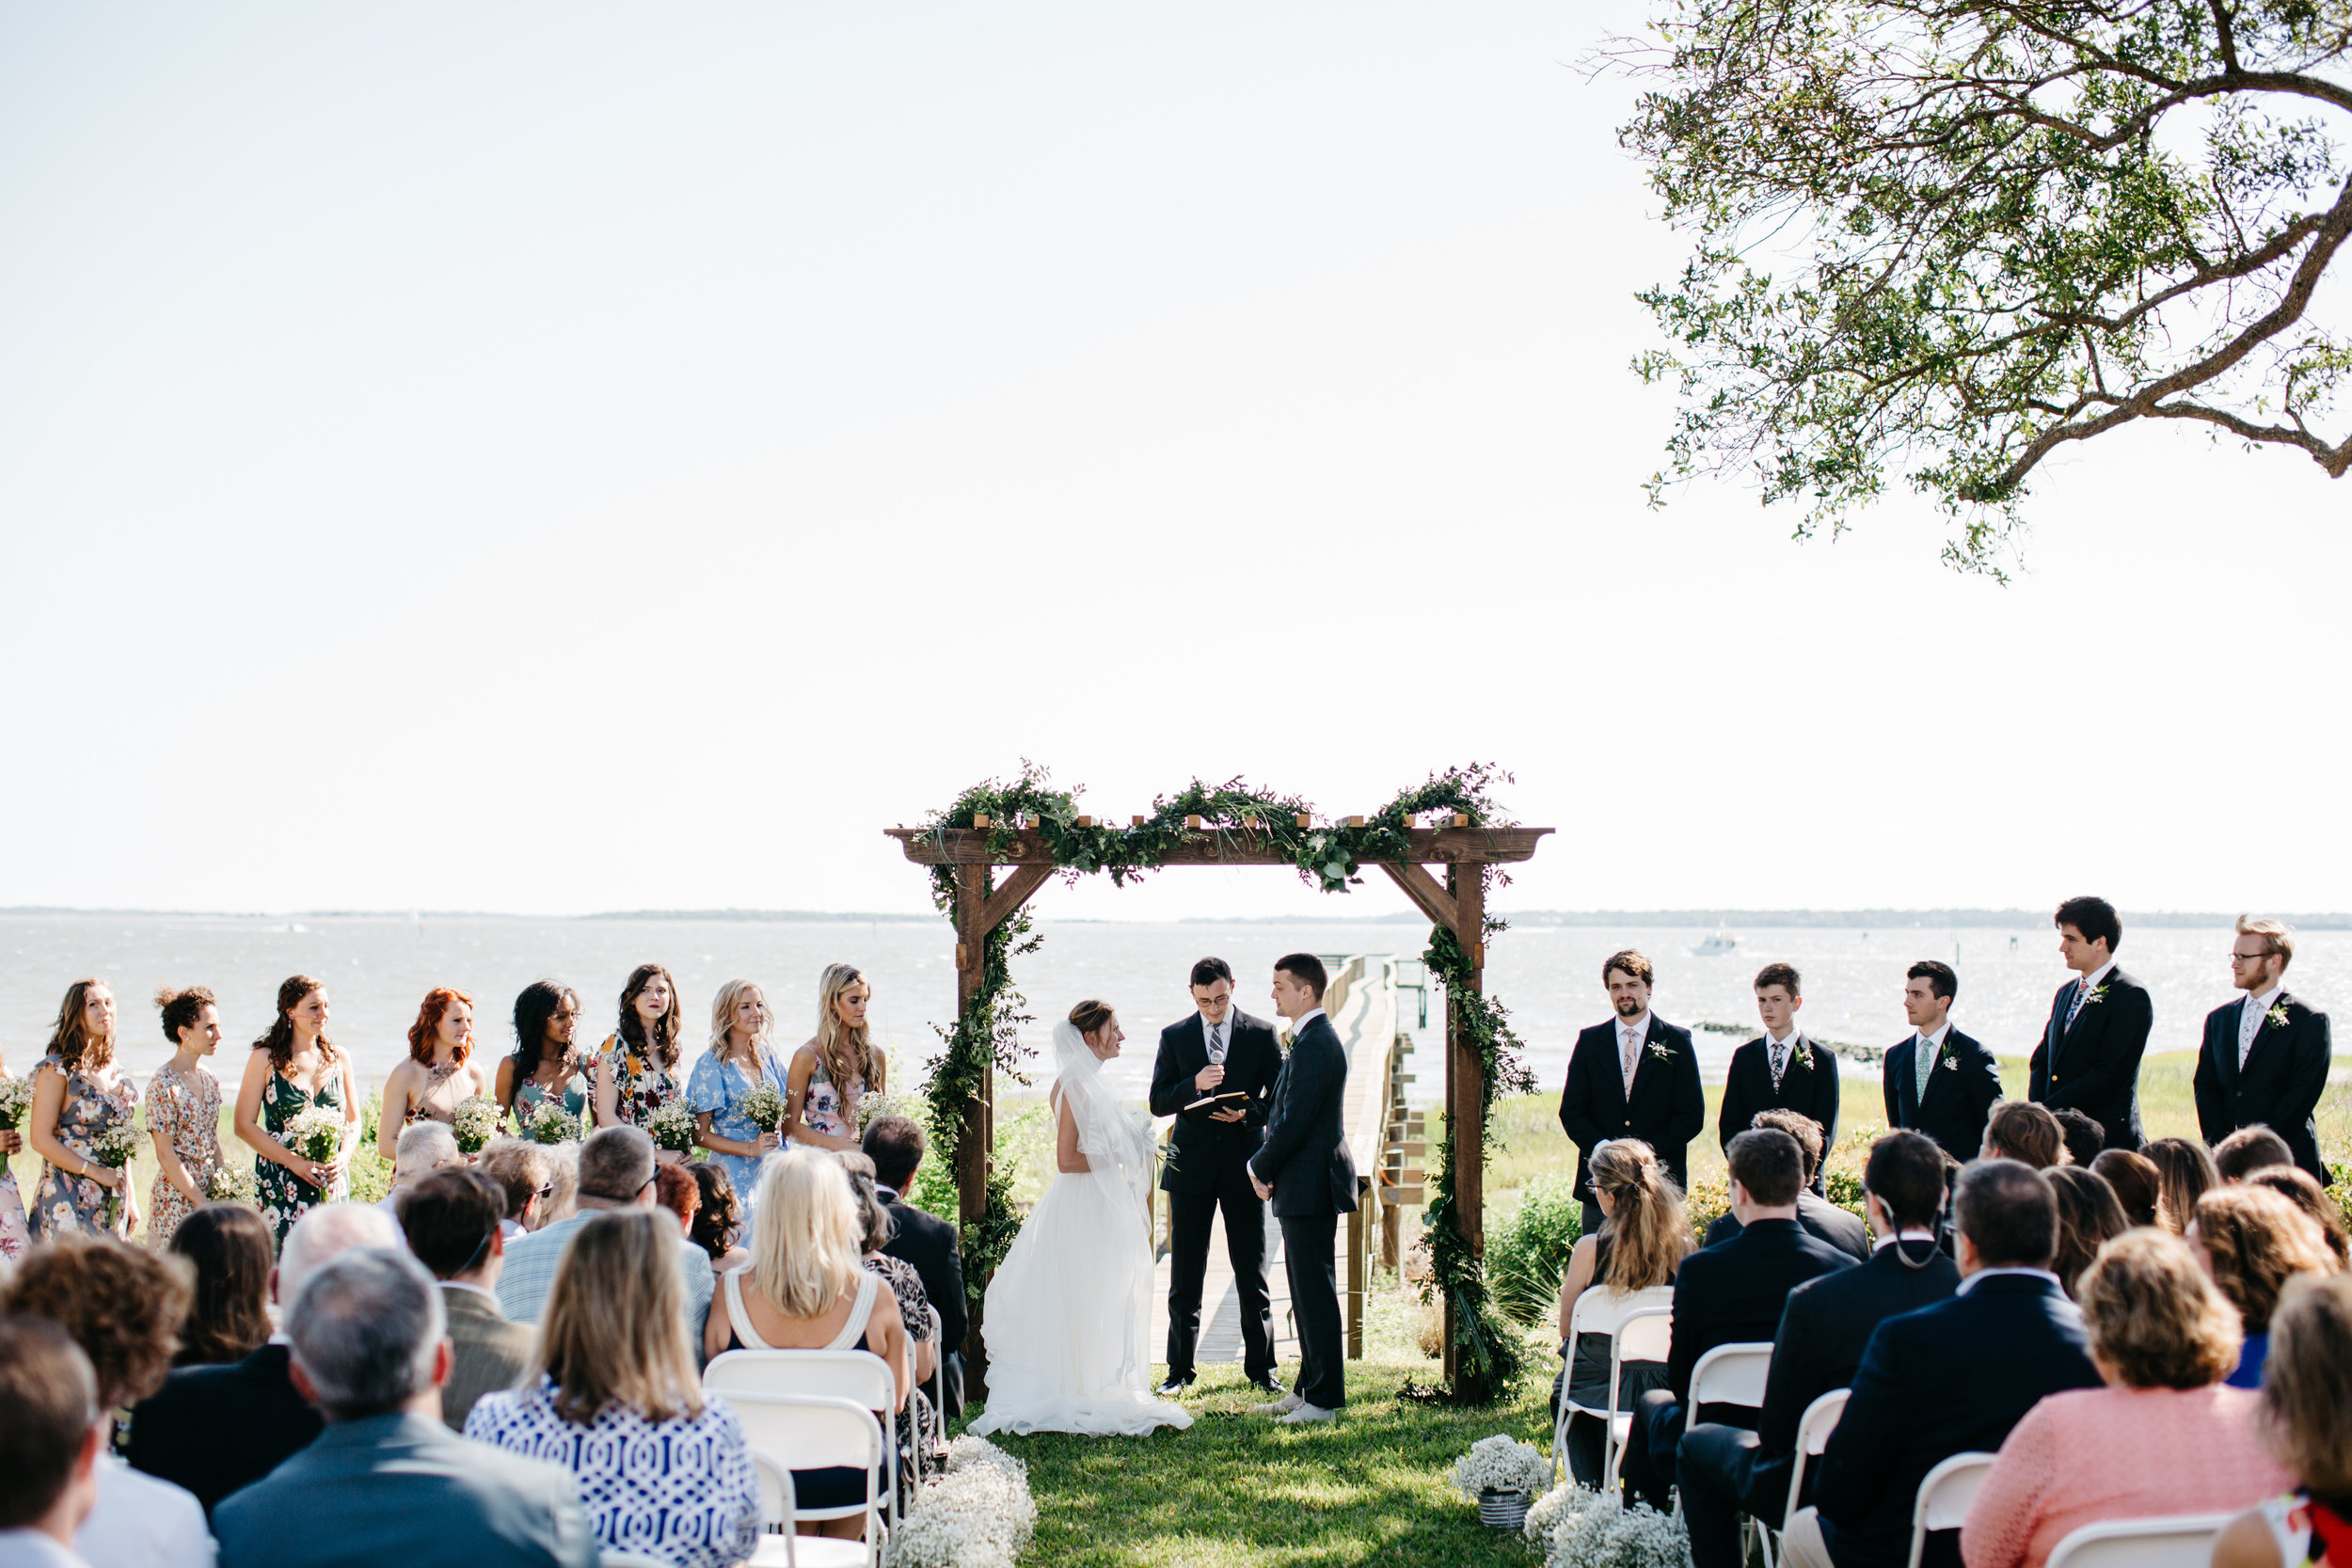 paraiso-event-design-charleston-mount-pleasant-waterfront-wedding-private-home-12.jpg